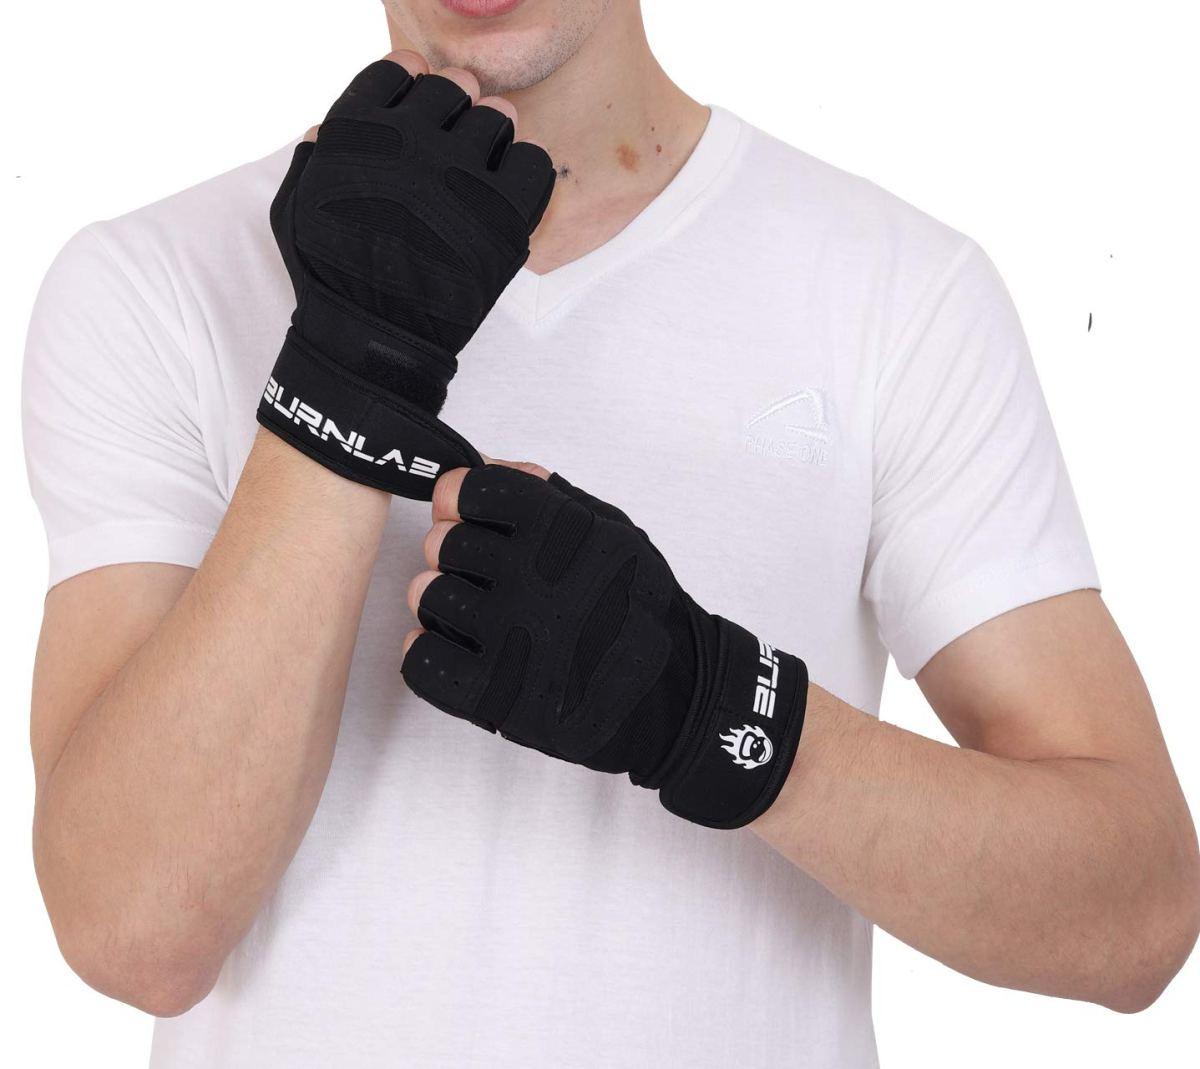 Burnlab Basic Gym Gloves with Wrist Support